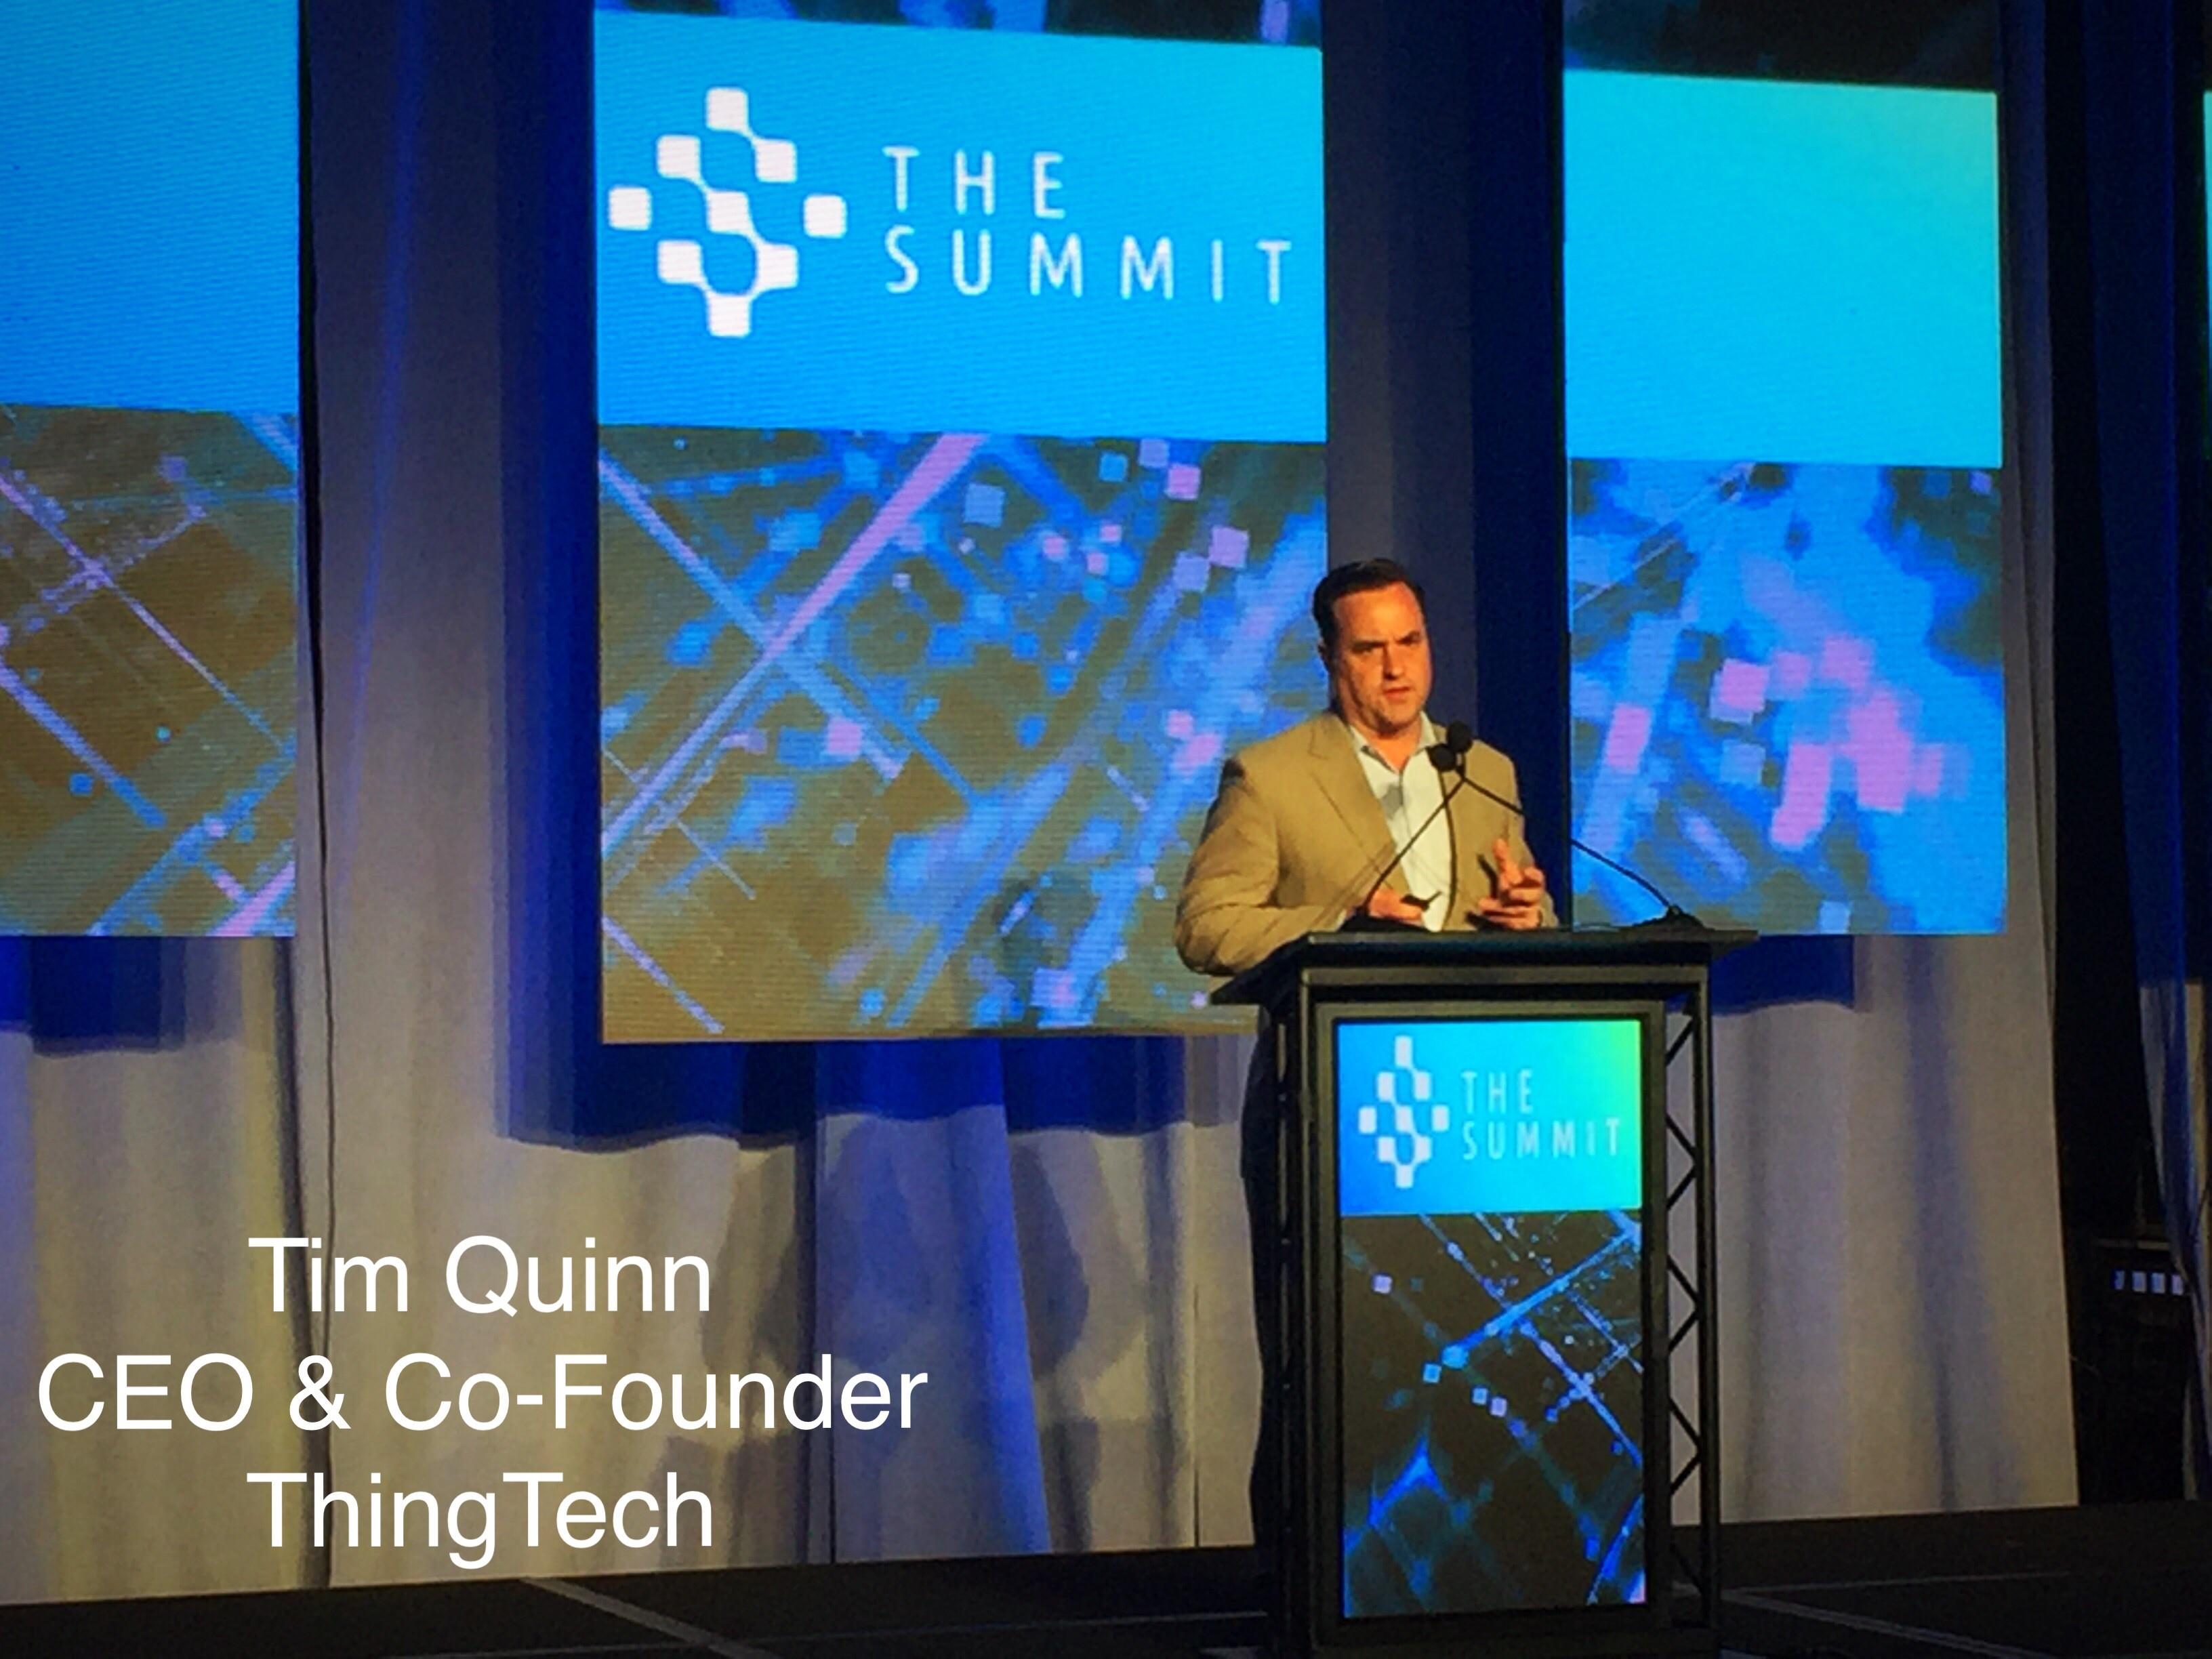 Tim Quinn, ThingTech, TAG, The Summit 2018, ThingTech, 2018 Top 10 Innovation Award